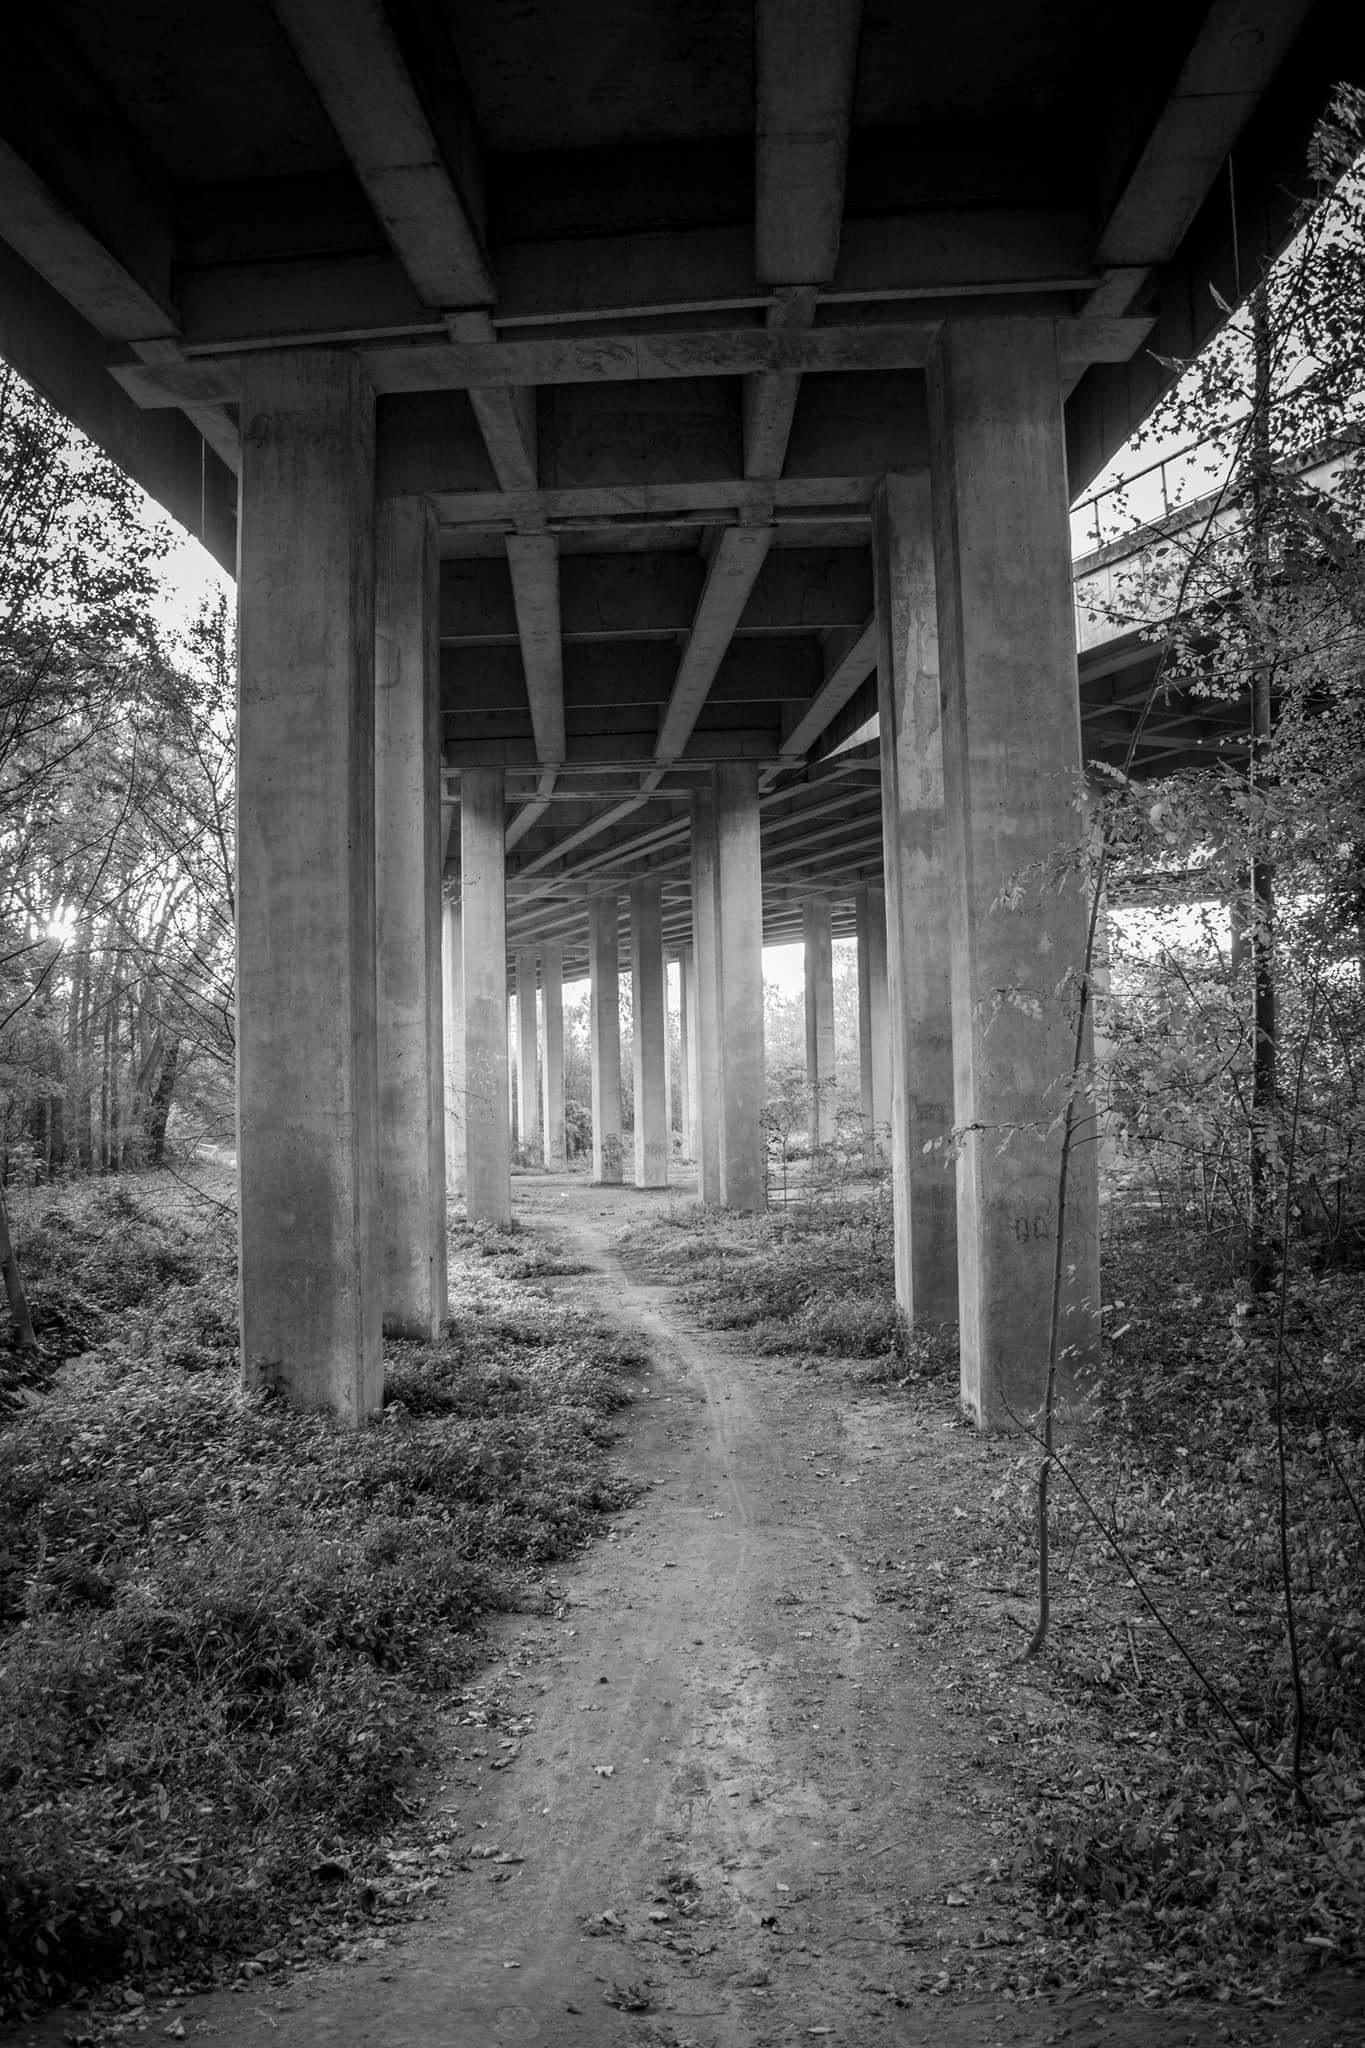 under the bridge by DE KERF ANTHONY